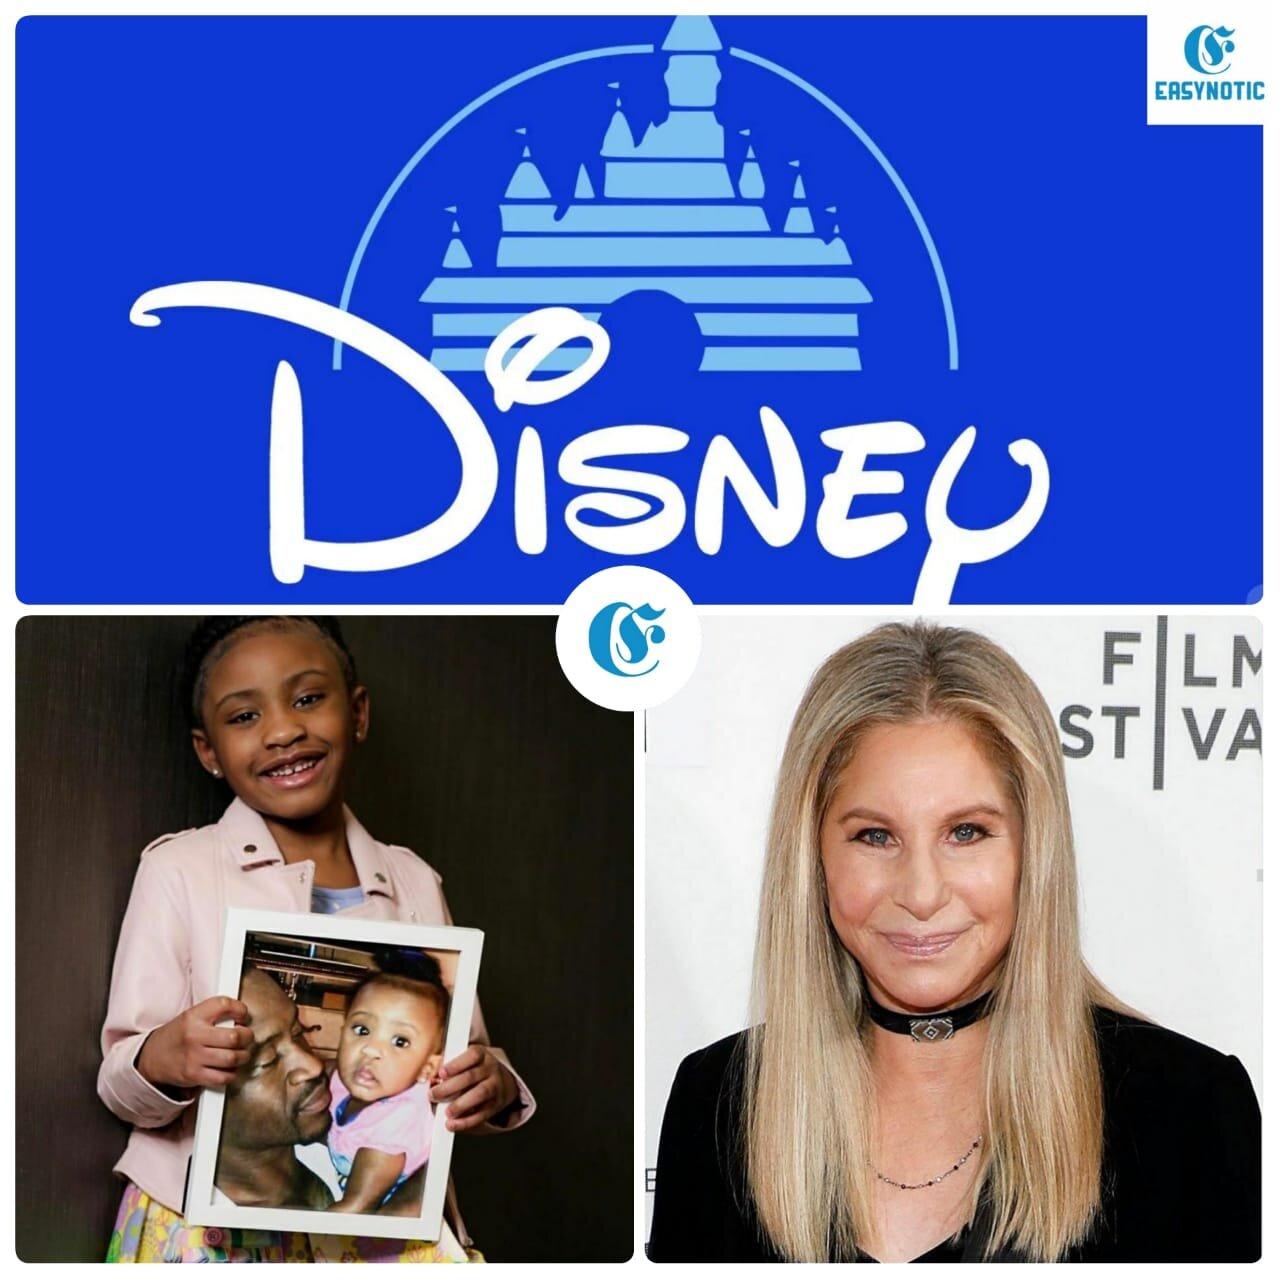 Gianna Floyd se convierte en accionista de Disney